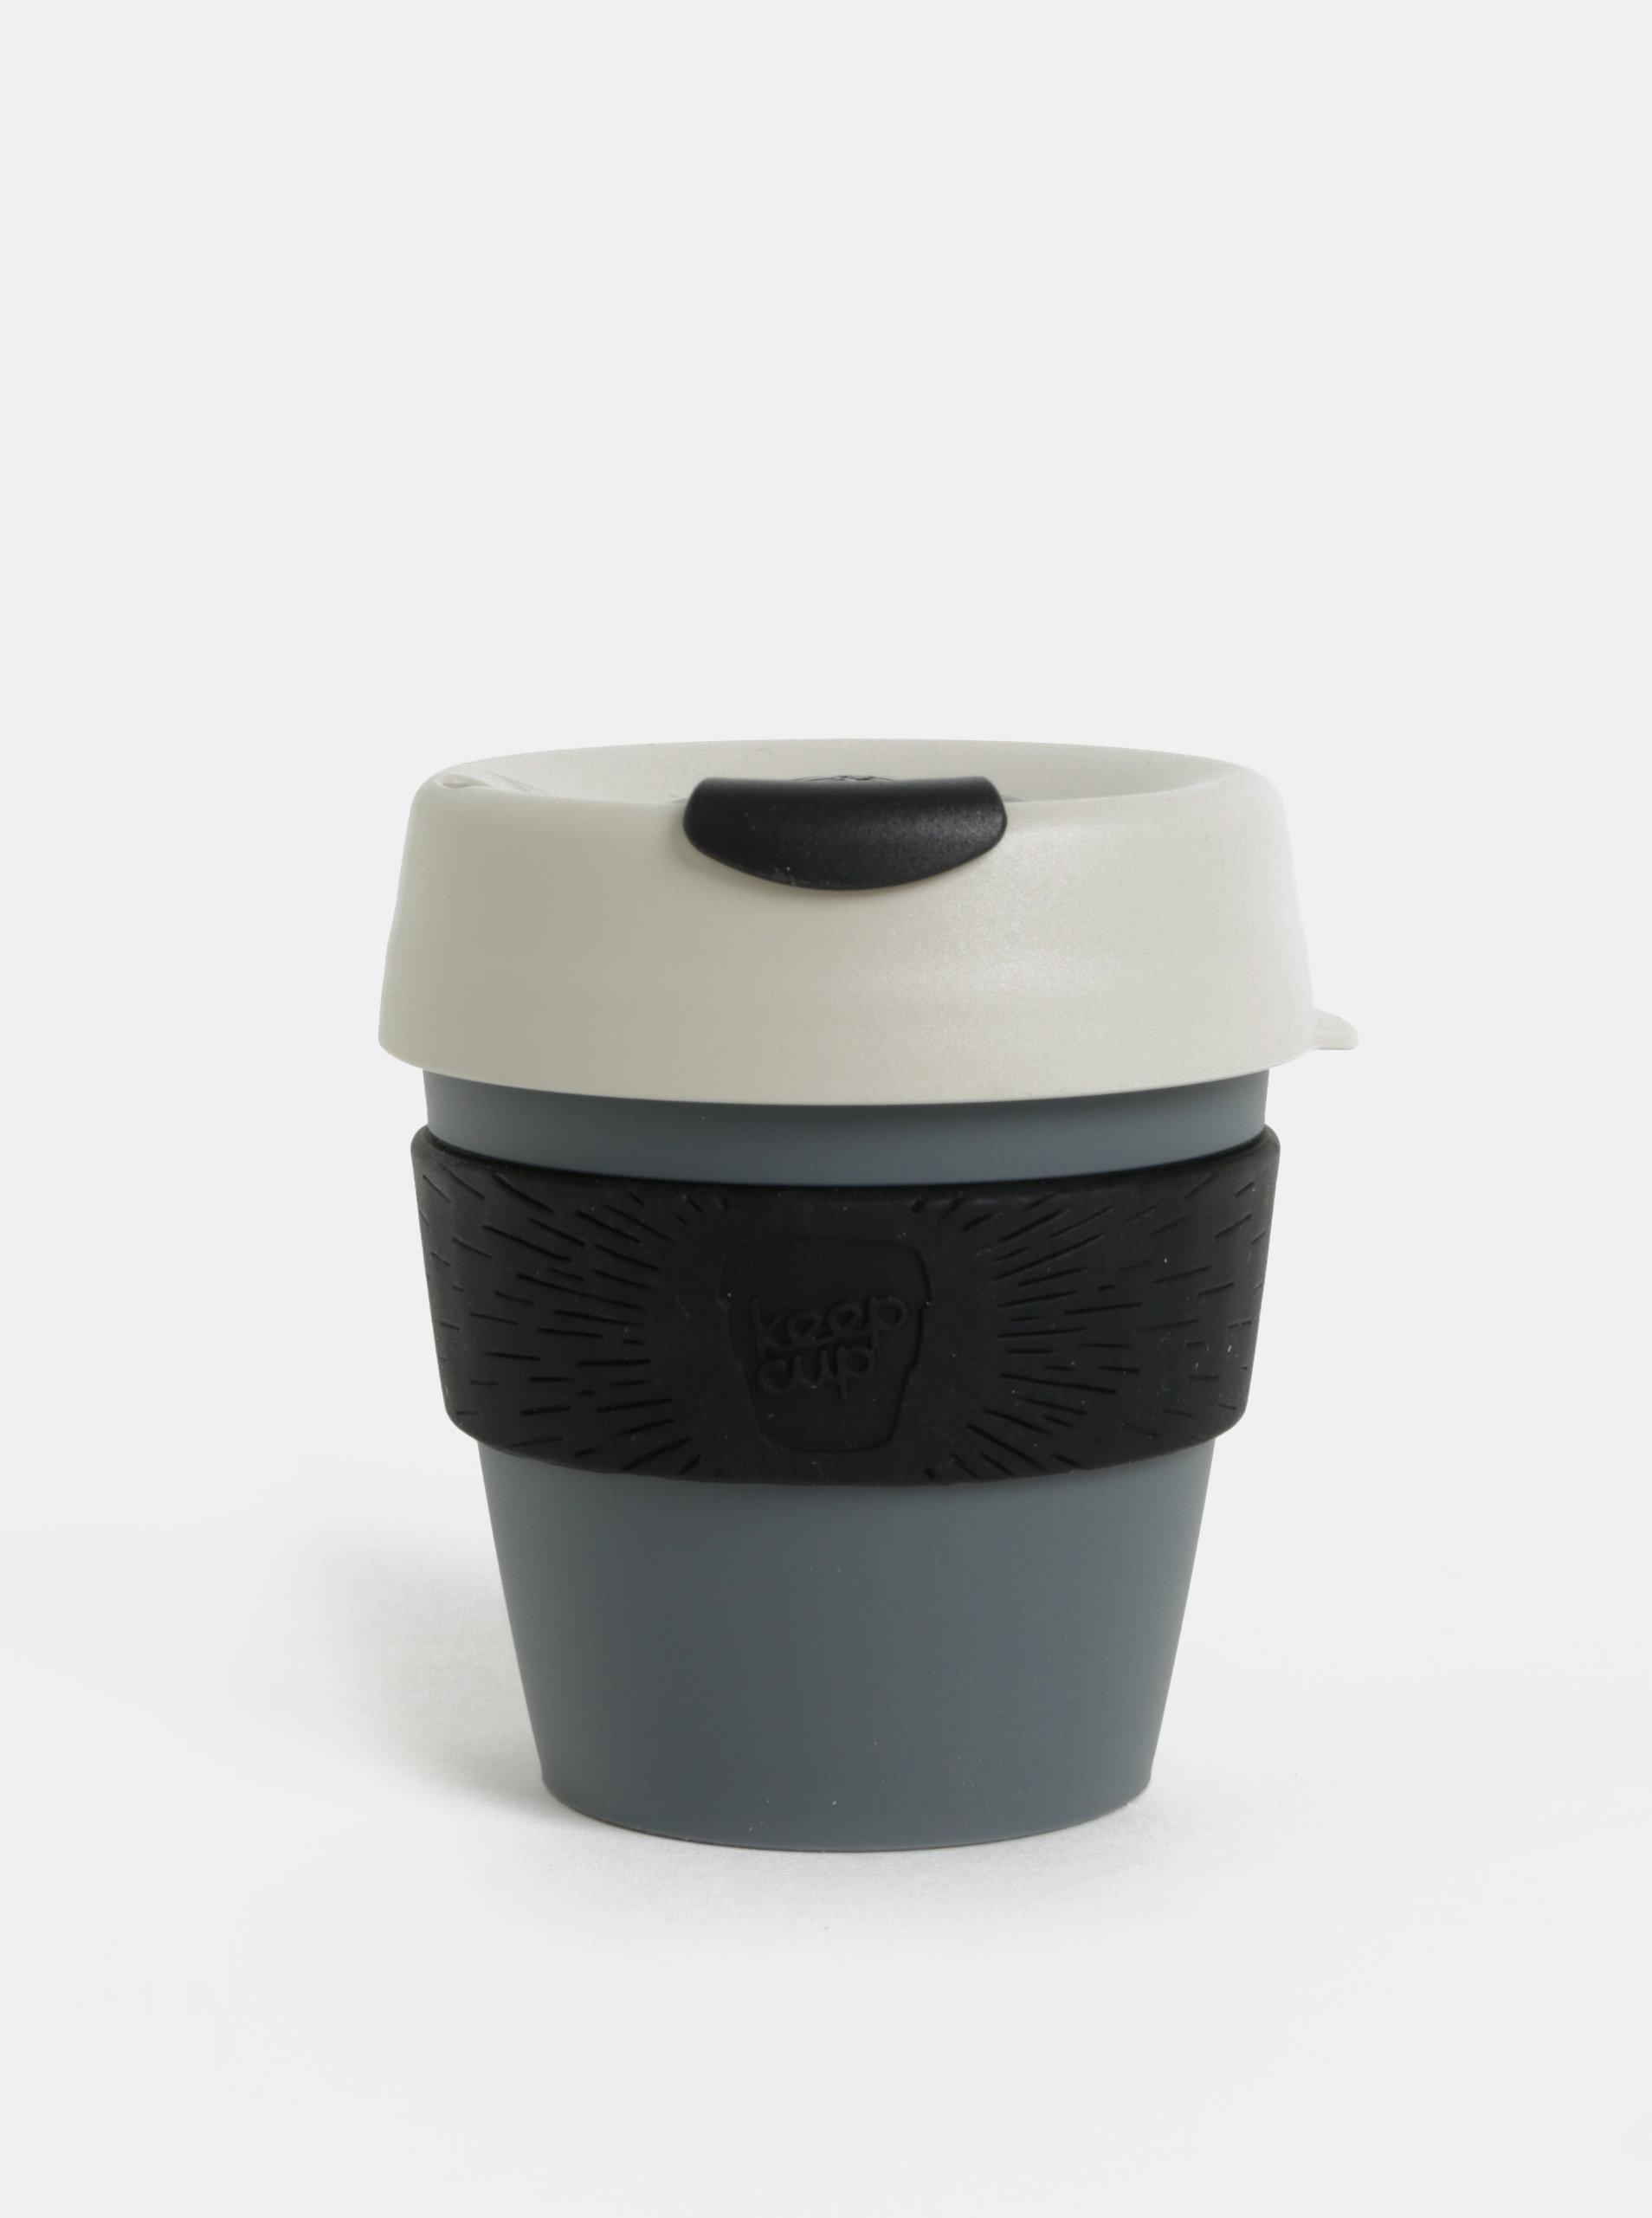 Čierno-sivý cestovný hrnček KeepCup Original Small ... af45dba050